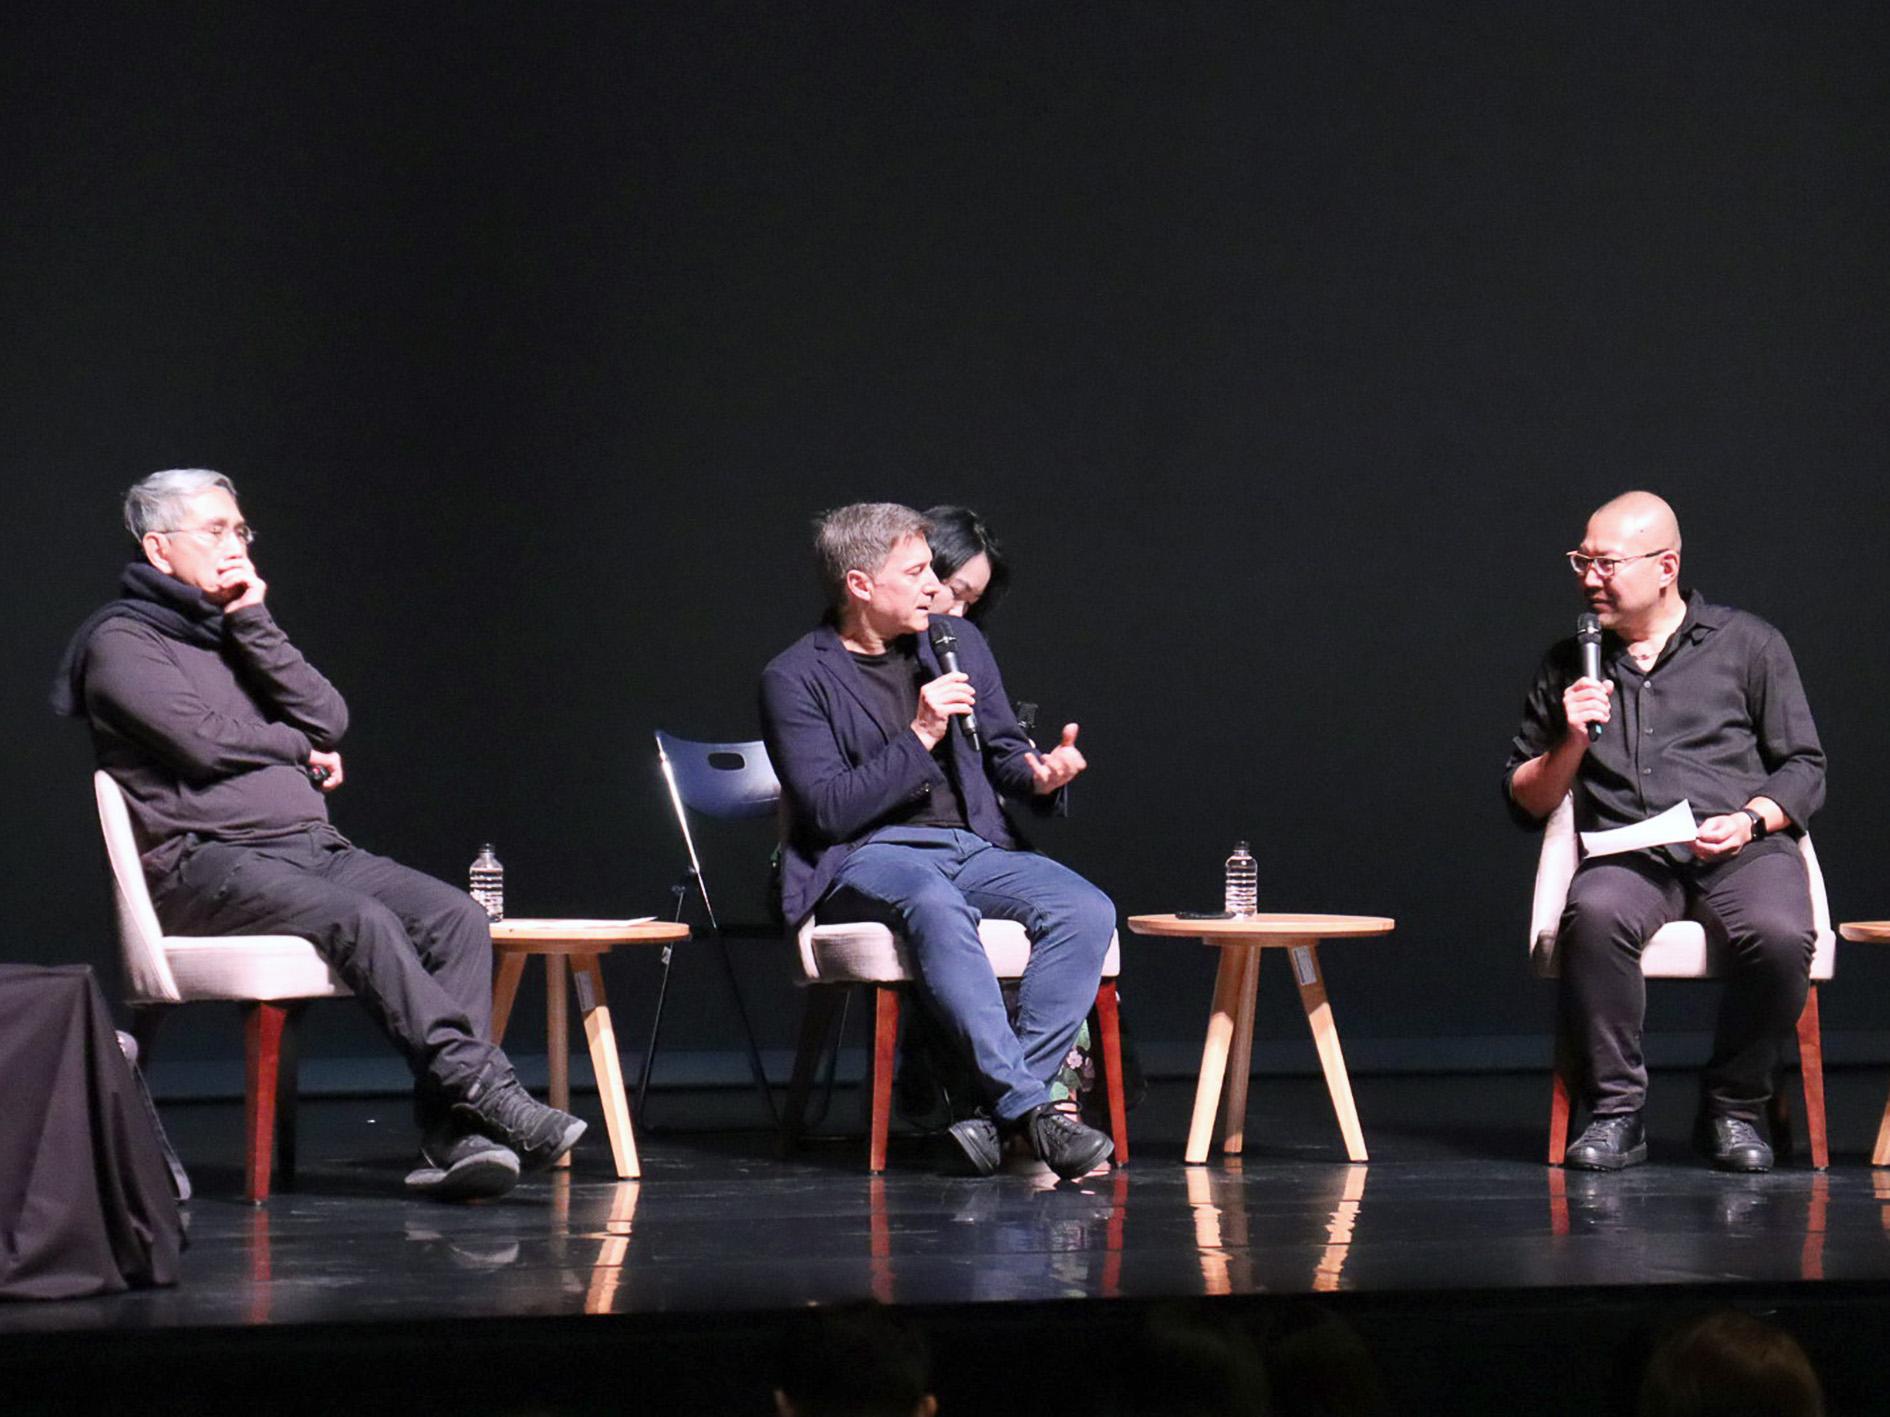 Lin Hwai-min, Martin Schläpfer, Wen-Pin Chien